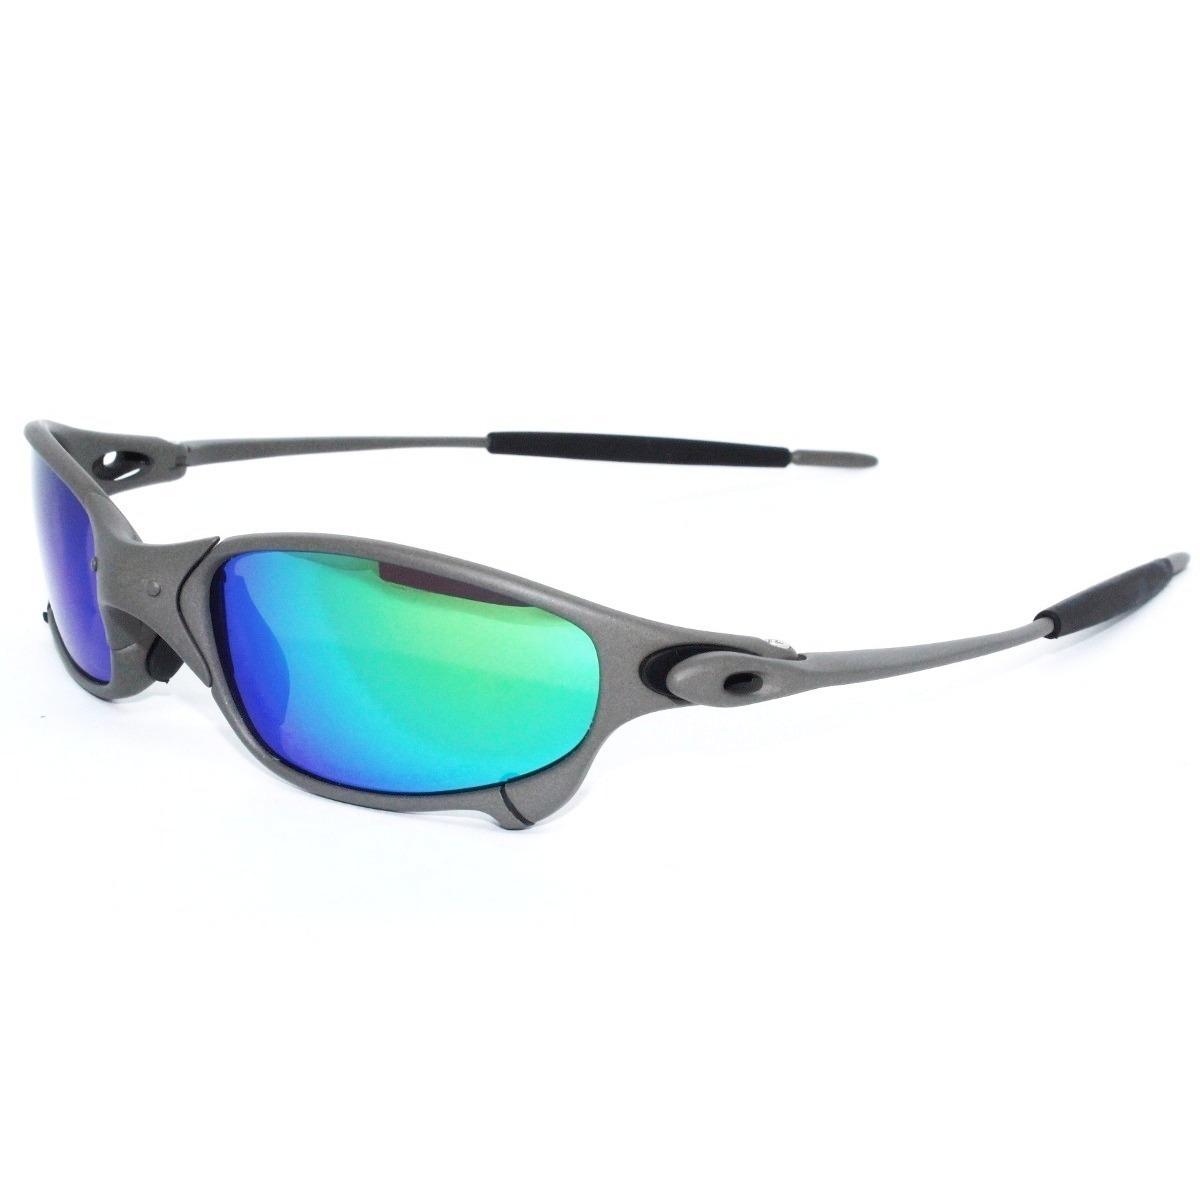 Óculos Oakley Juliet 100% 24k 100% Polarizado Pronta Entrega - R ... 1c2222557e